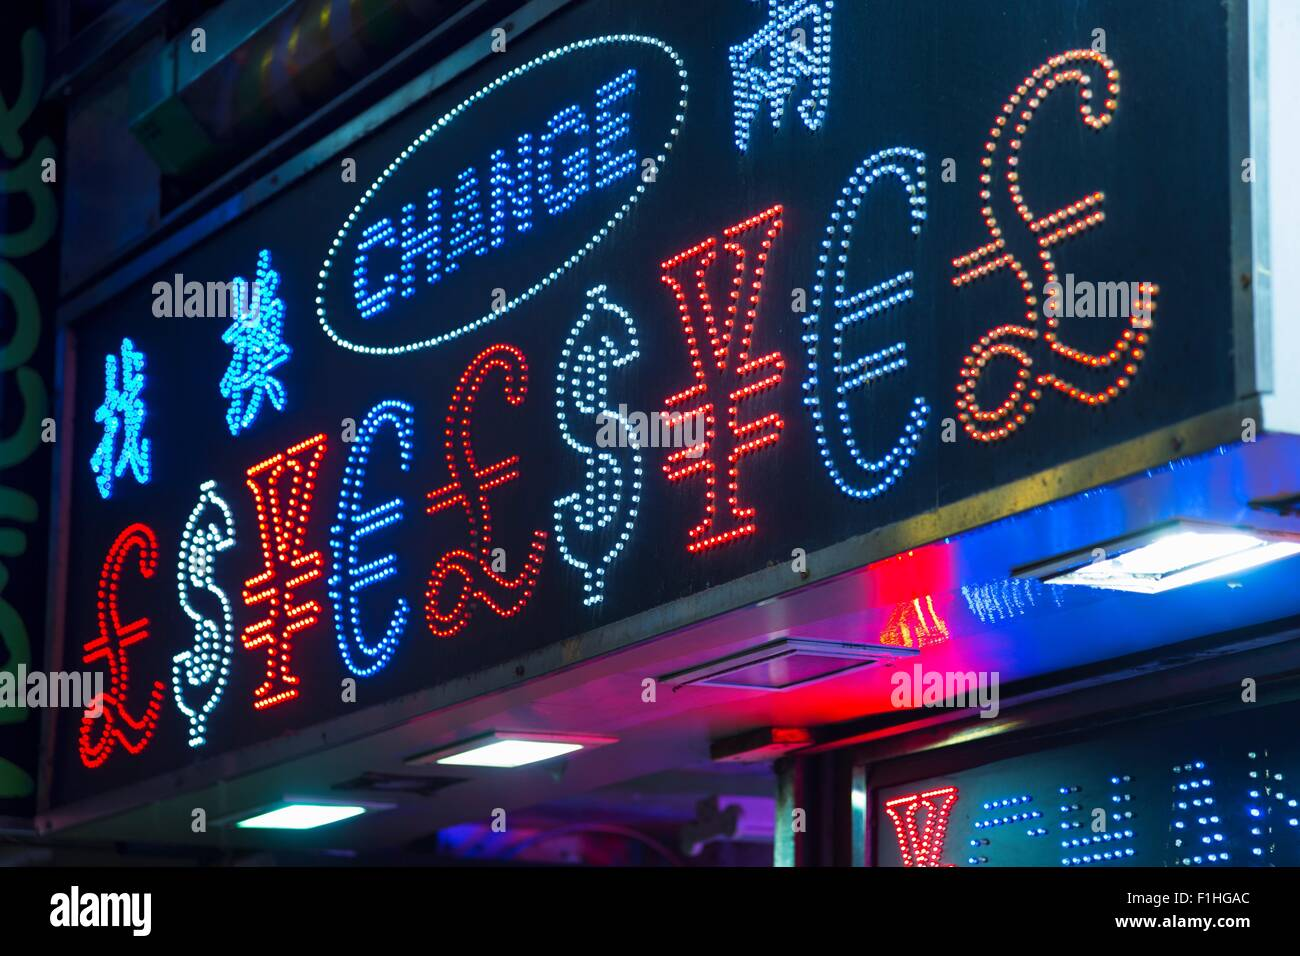 Illuminated currency exchange sign, Hong Kong, China - Stock Image